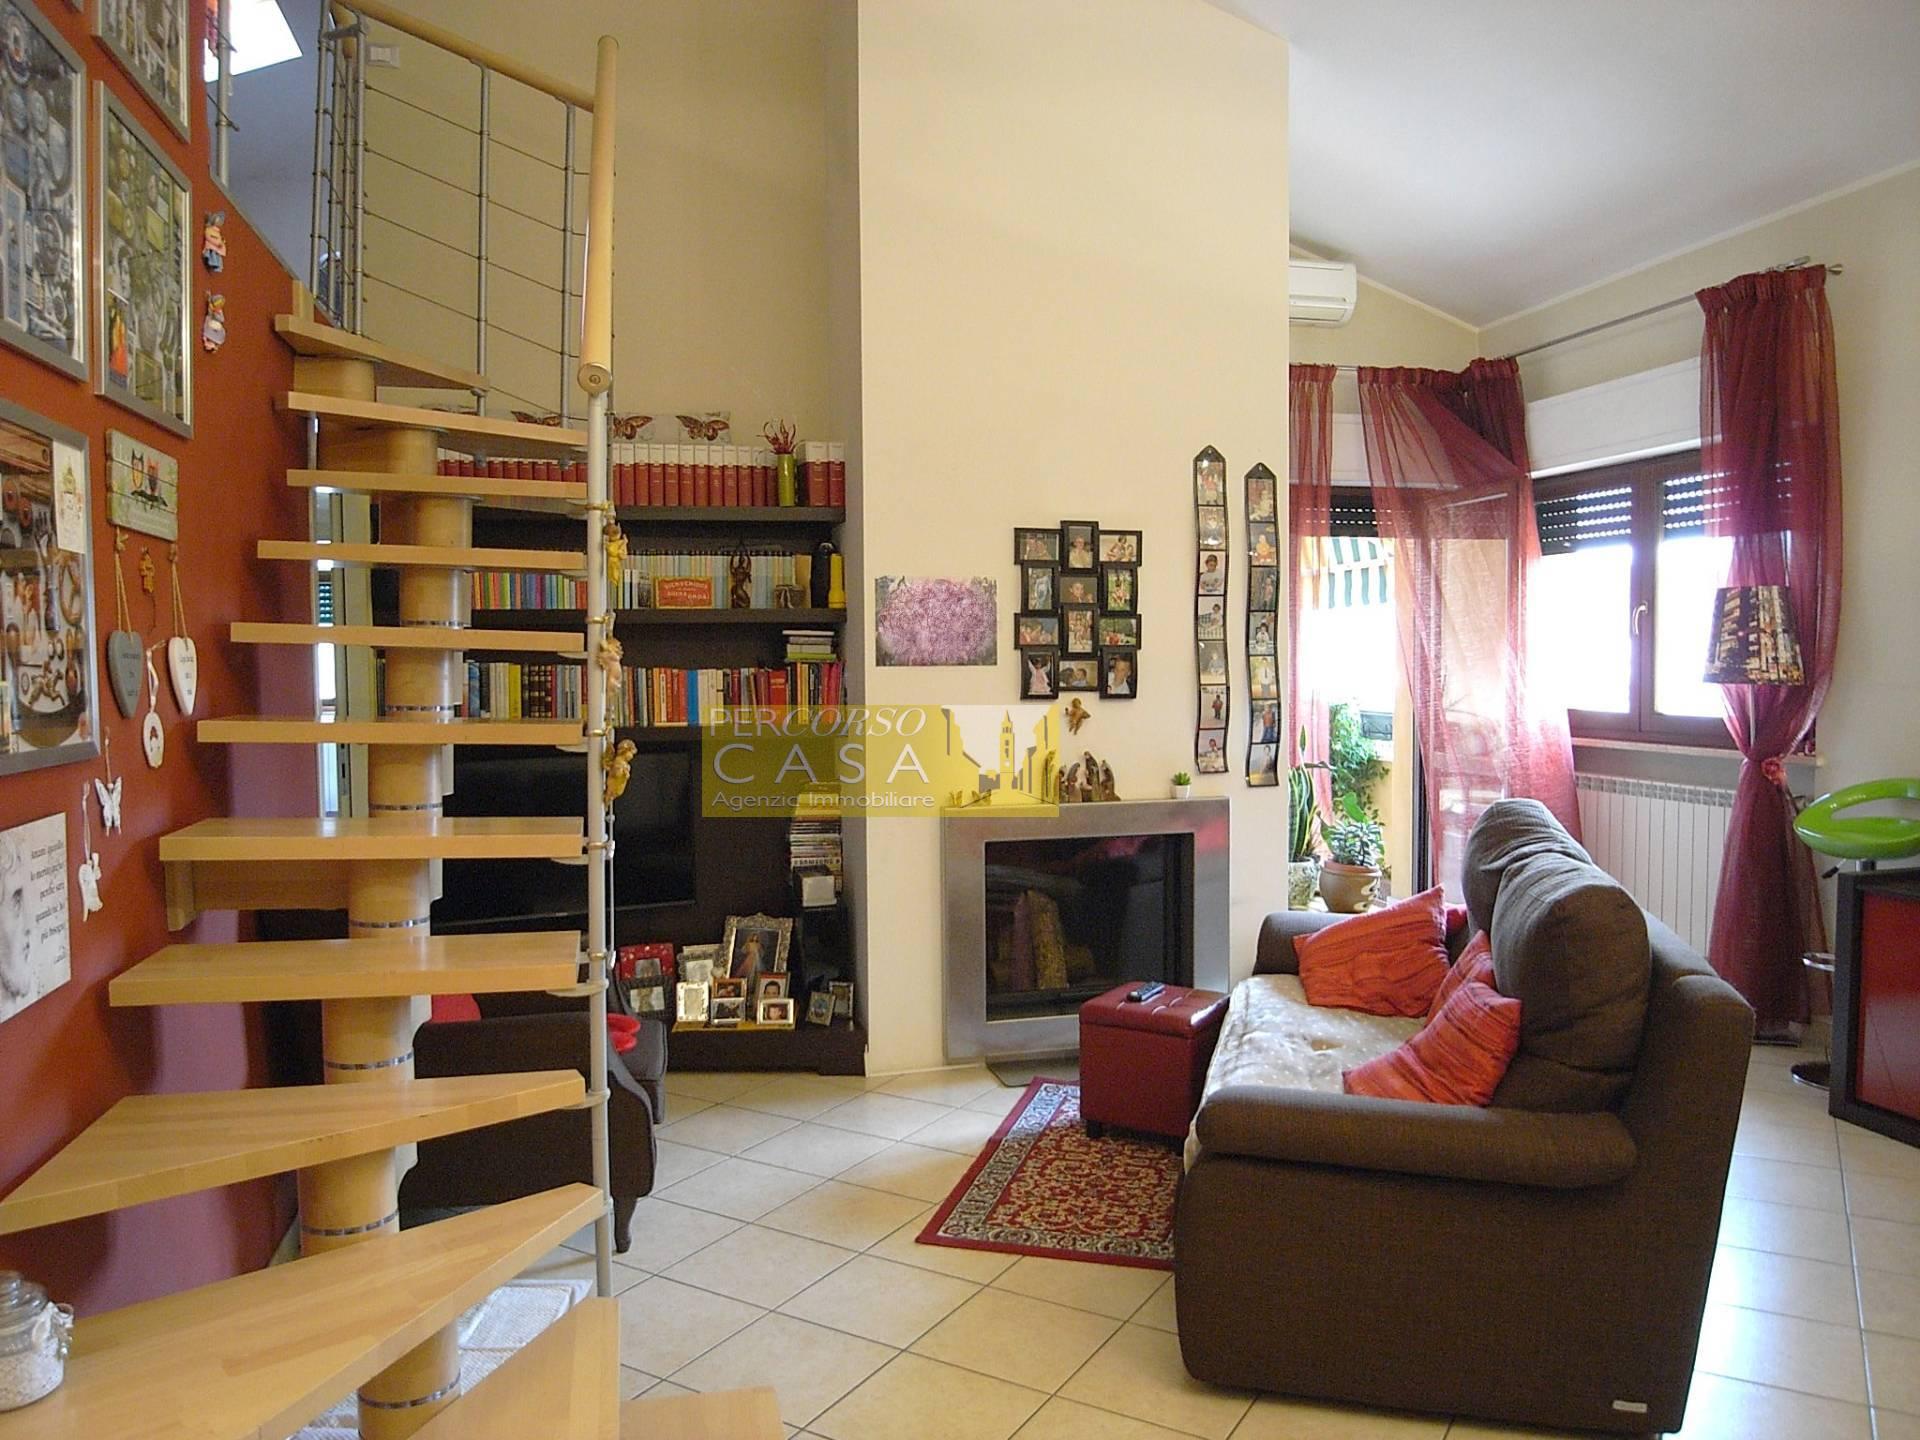 teramo vendita quart: villa mosca percorso-casa-srl-unipersonale